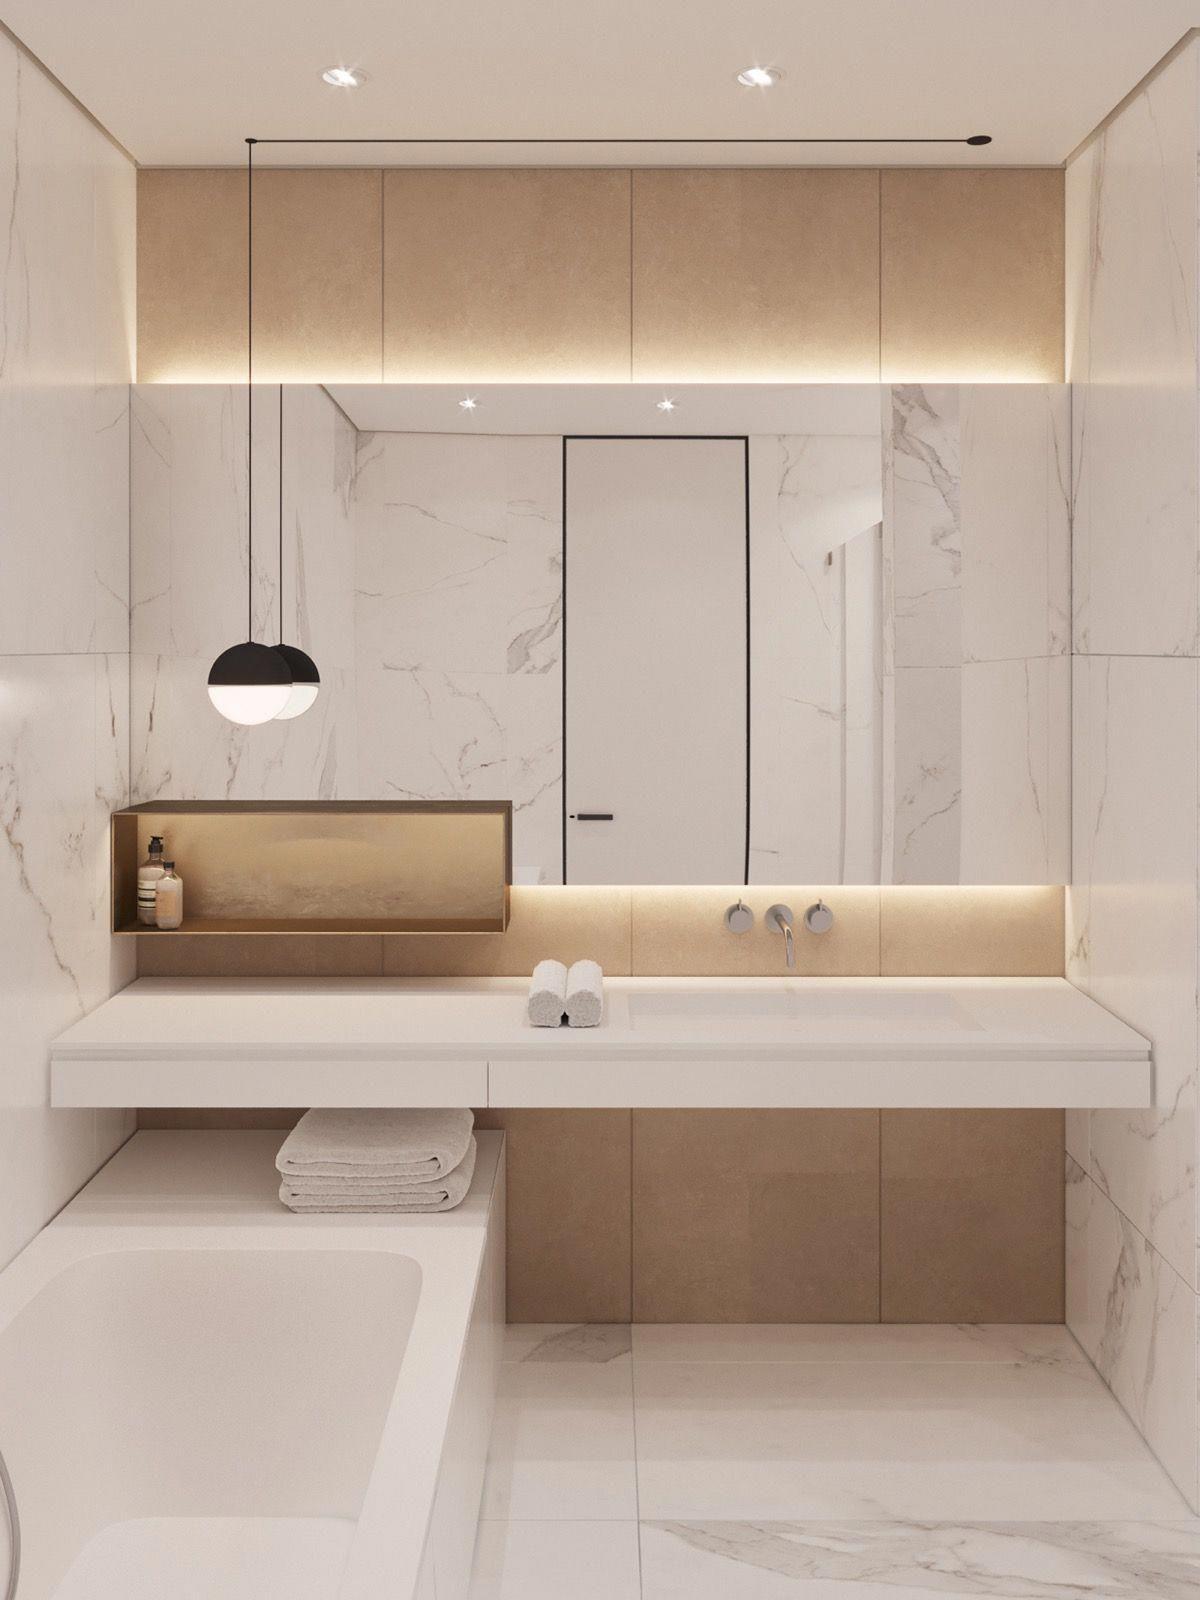 40 Best Modern Bathroom Wall Design Ideas To Give You Inspiration In 2020 Modern Bathroom Design Modern Bathroom Bathroom Interior Design